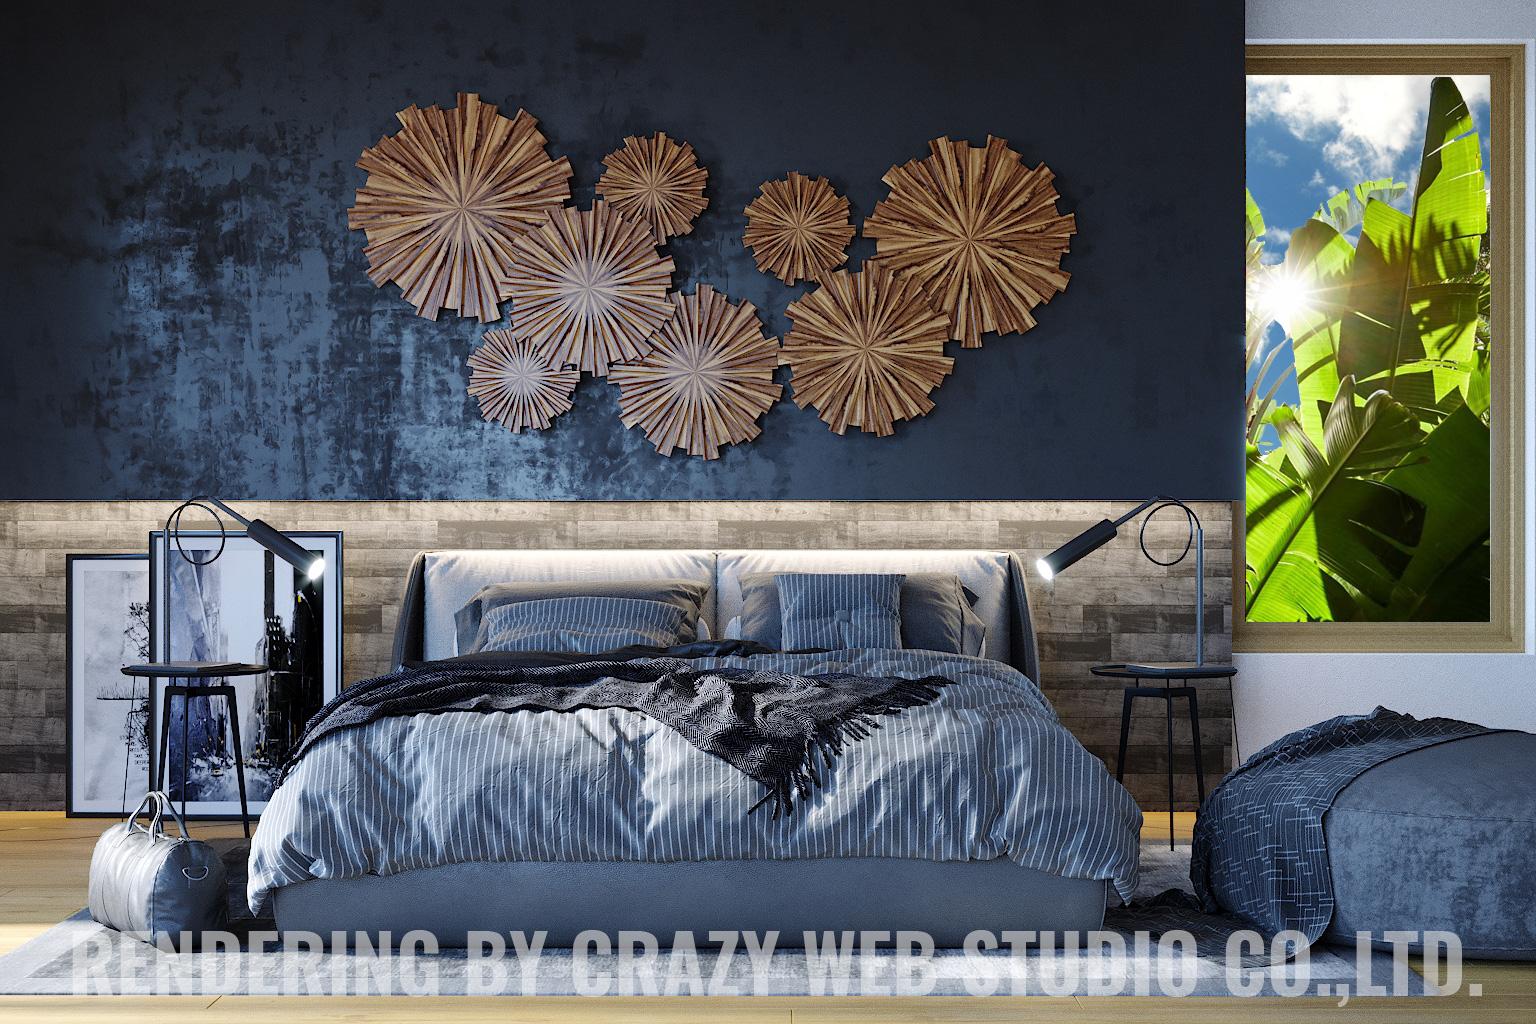 3D Rendering Photorealistic Interior Design Phuket Company Crazy Web Studio1